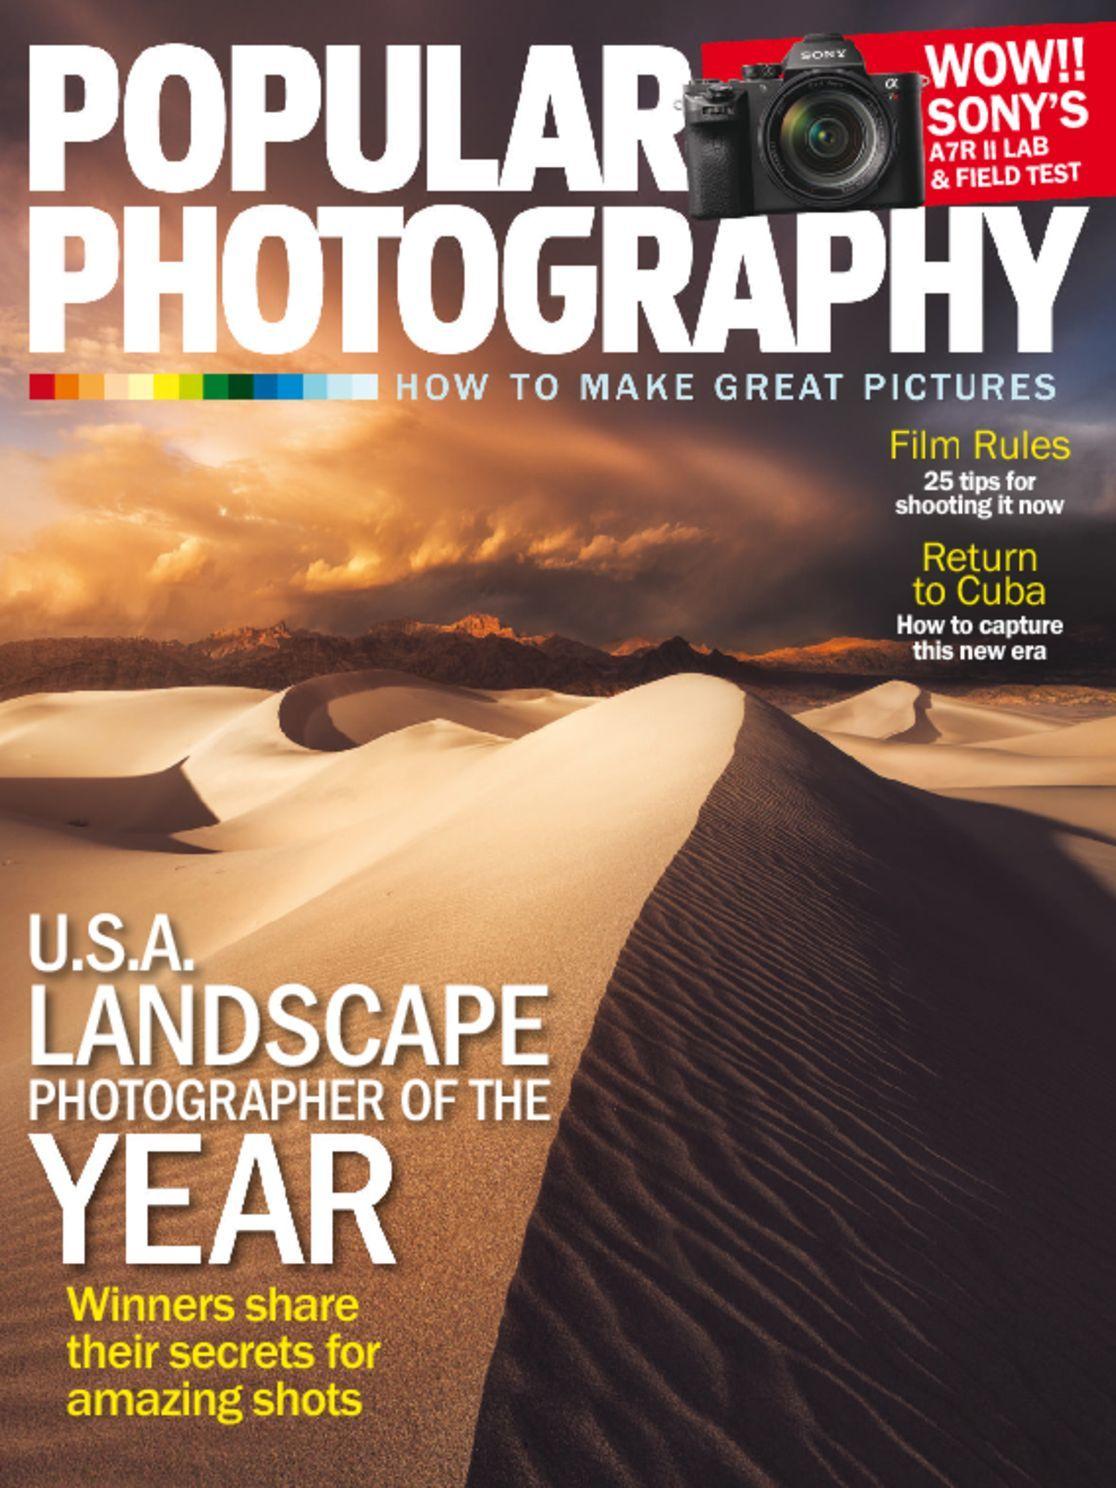 5682-popular-photography-Cover-2015-November-Issue.jpg